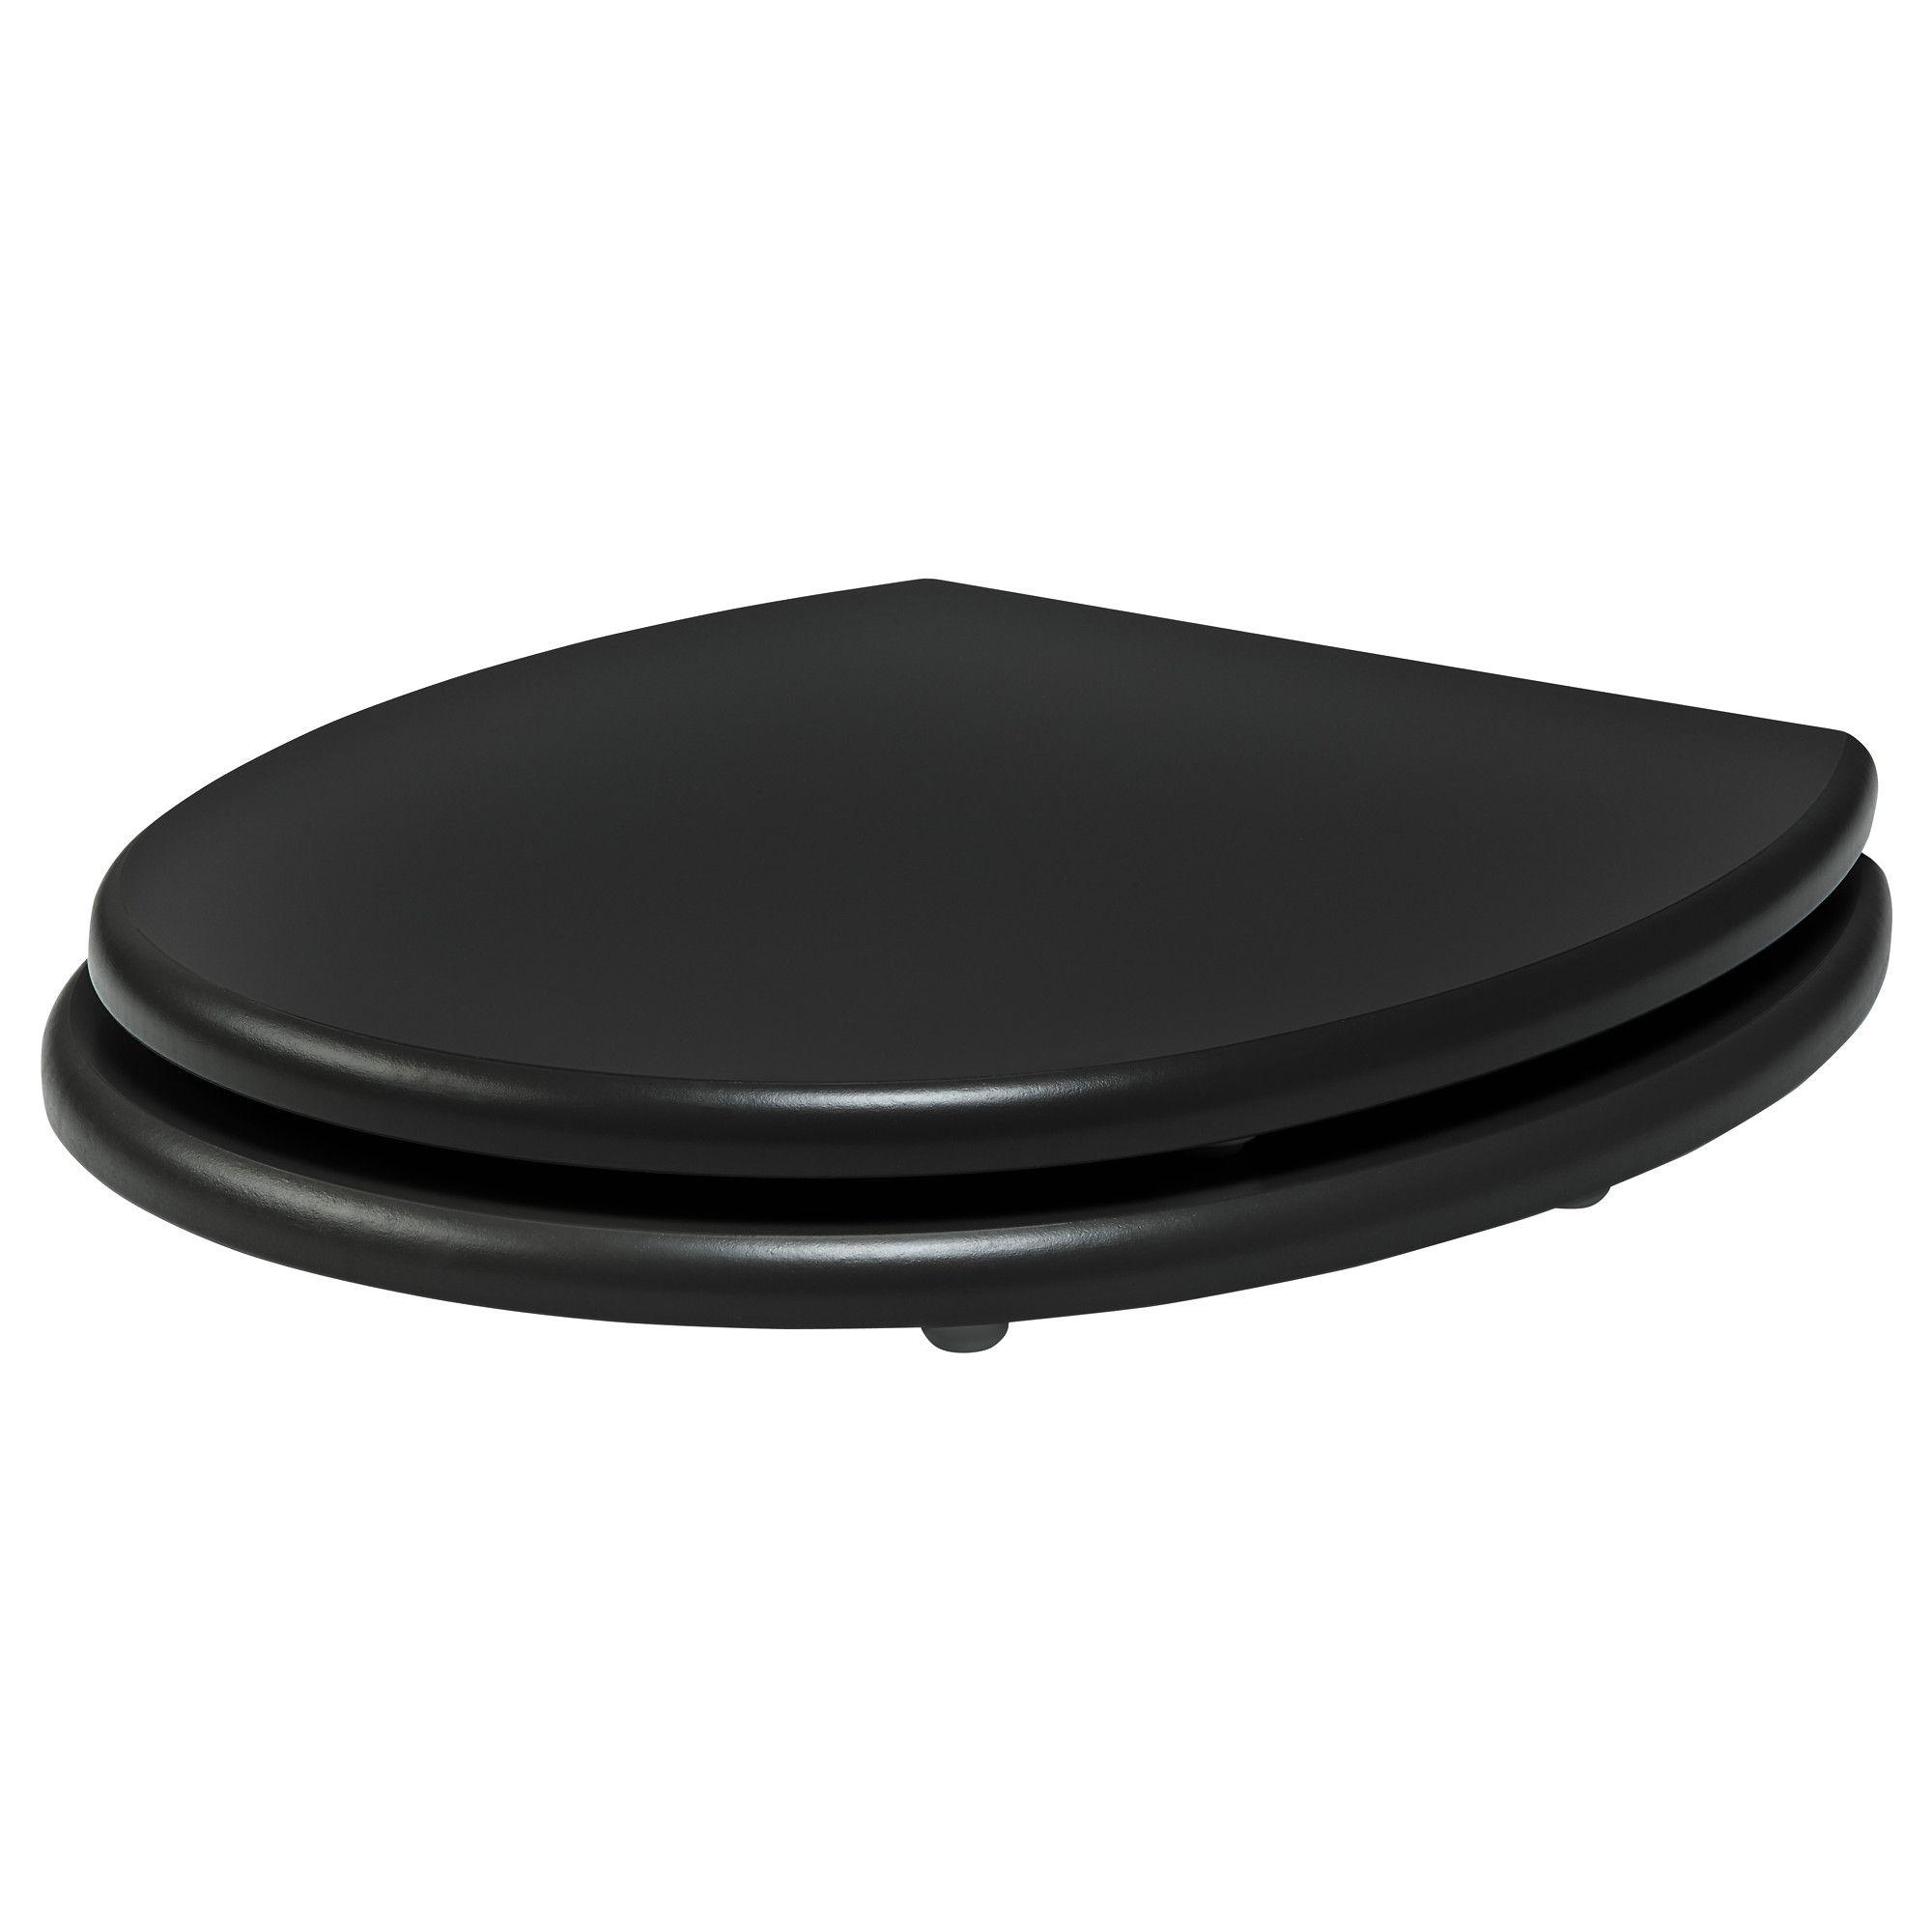 Abattant Wc Kullarna Noir En 2019 6 Wc Griddle Pan